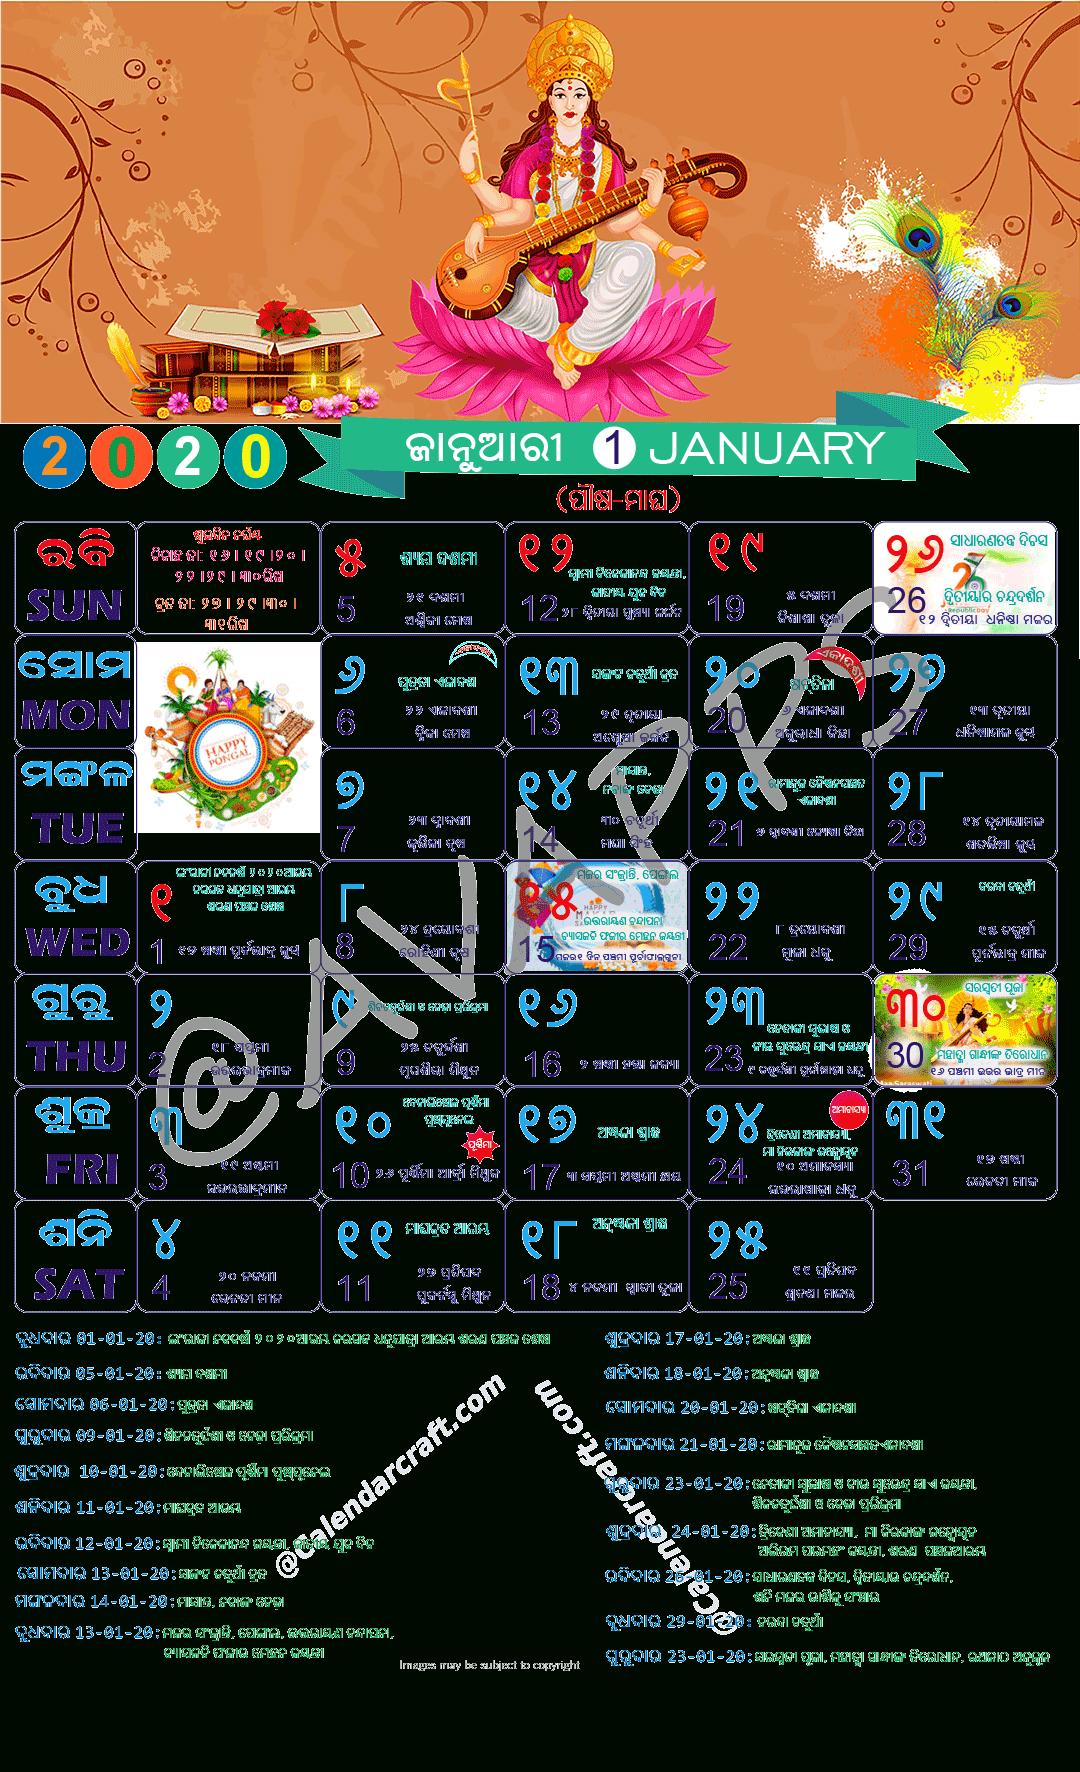 Odisha Govt School Holiday List 2019 Pdf - School Style